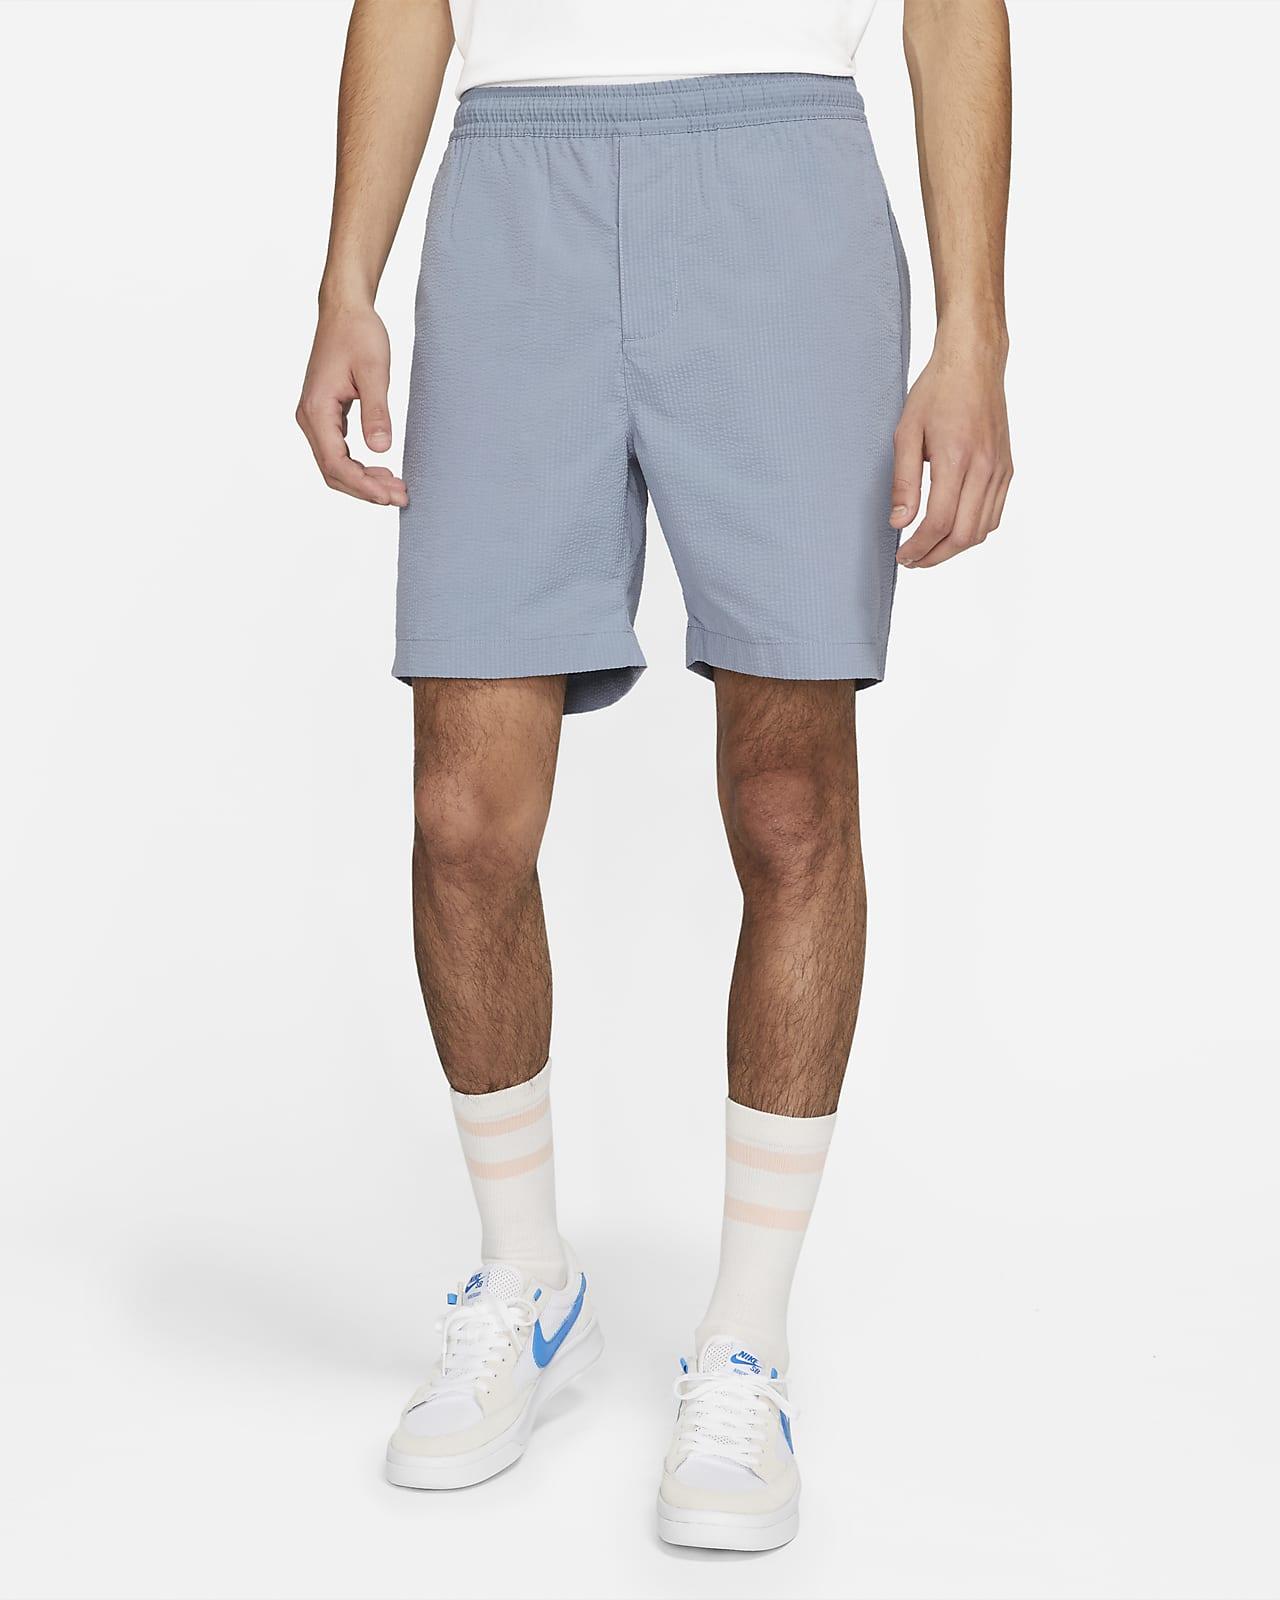 Nike SB 套穿式滑板斜紋棉布短褲